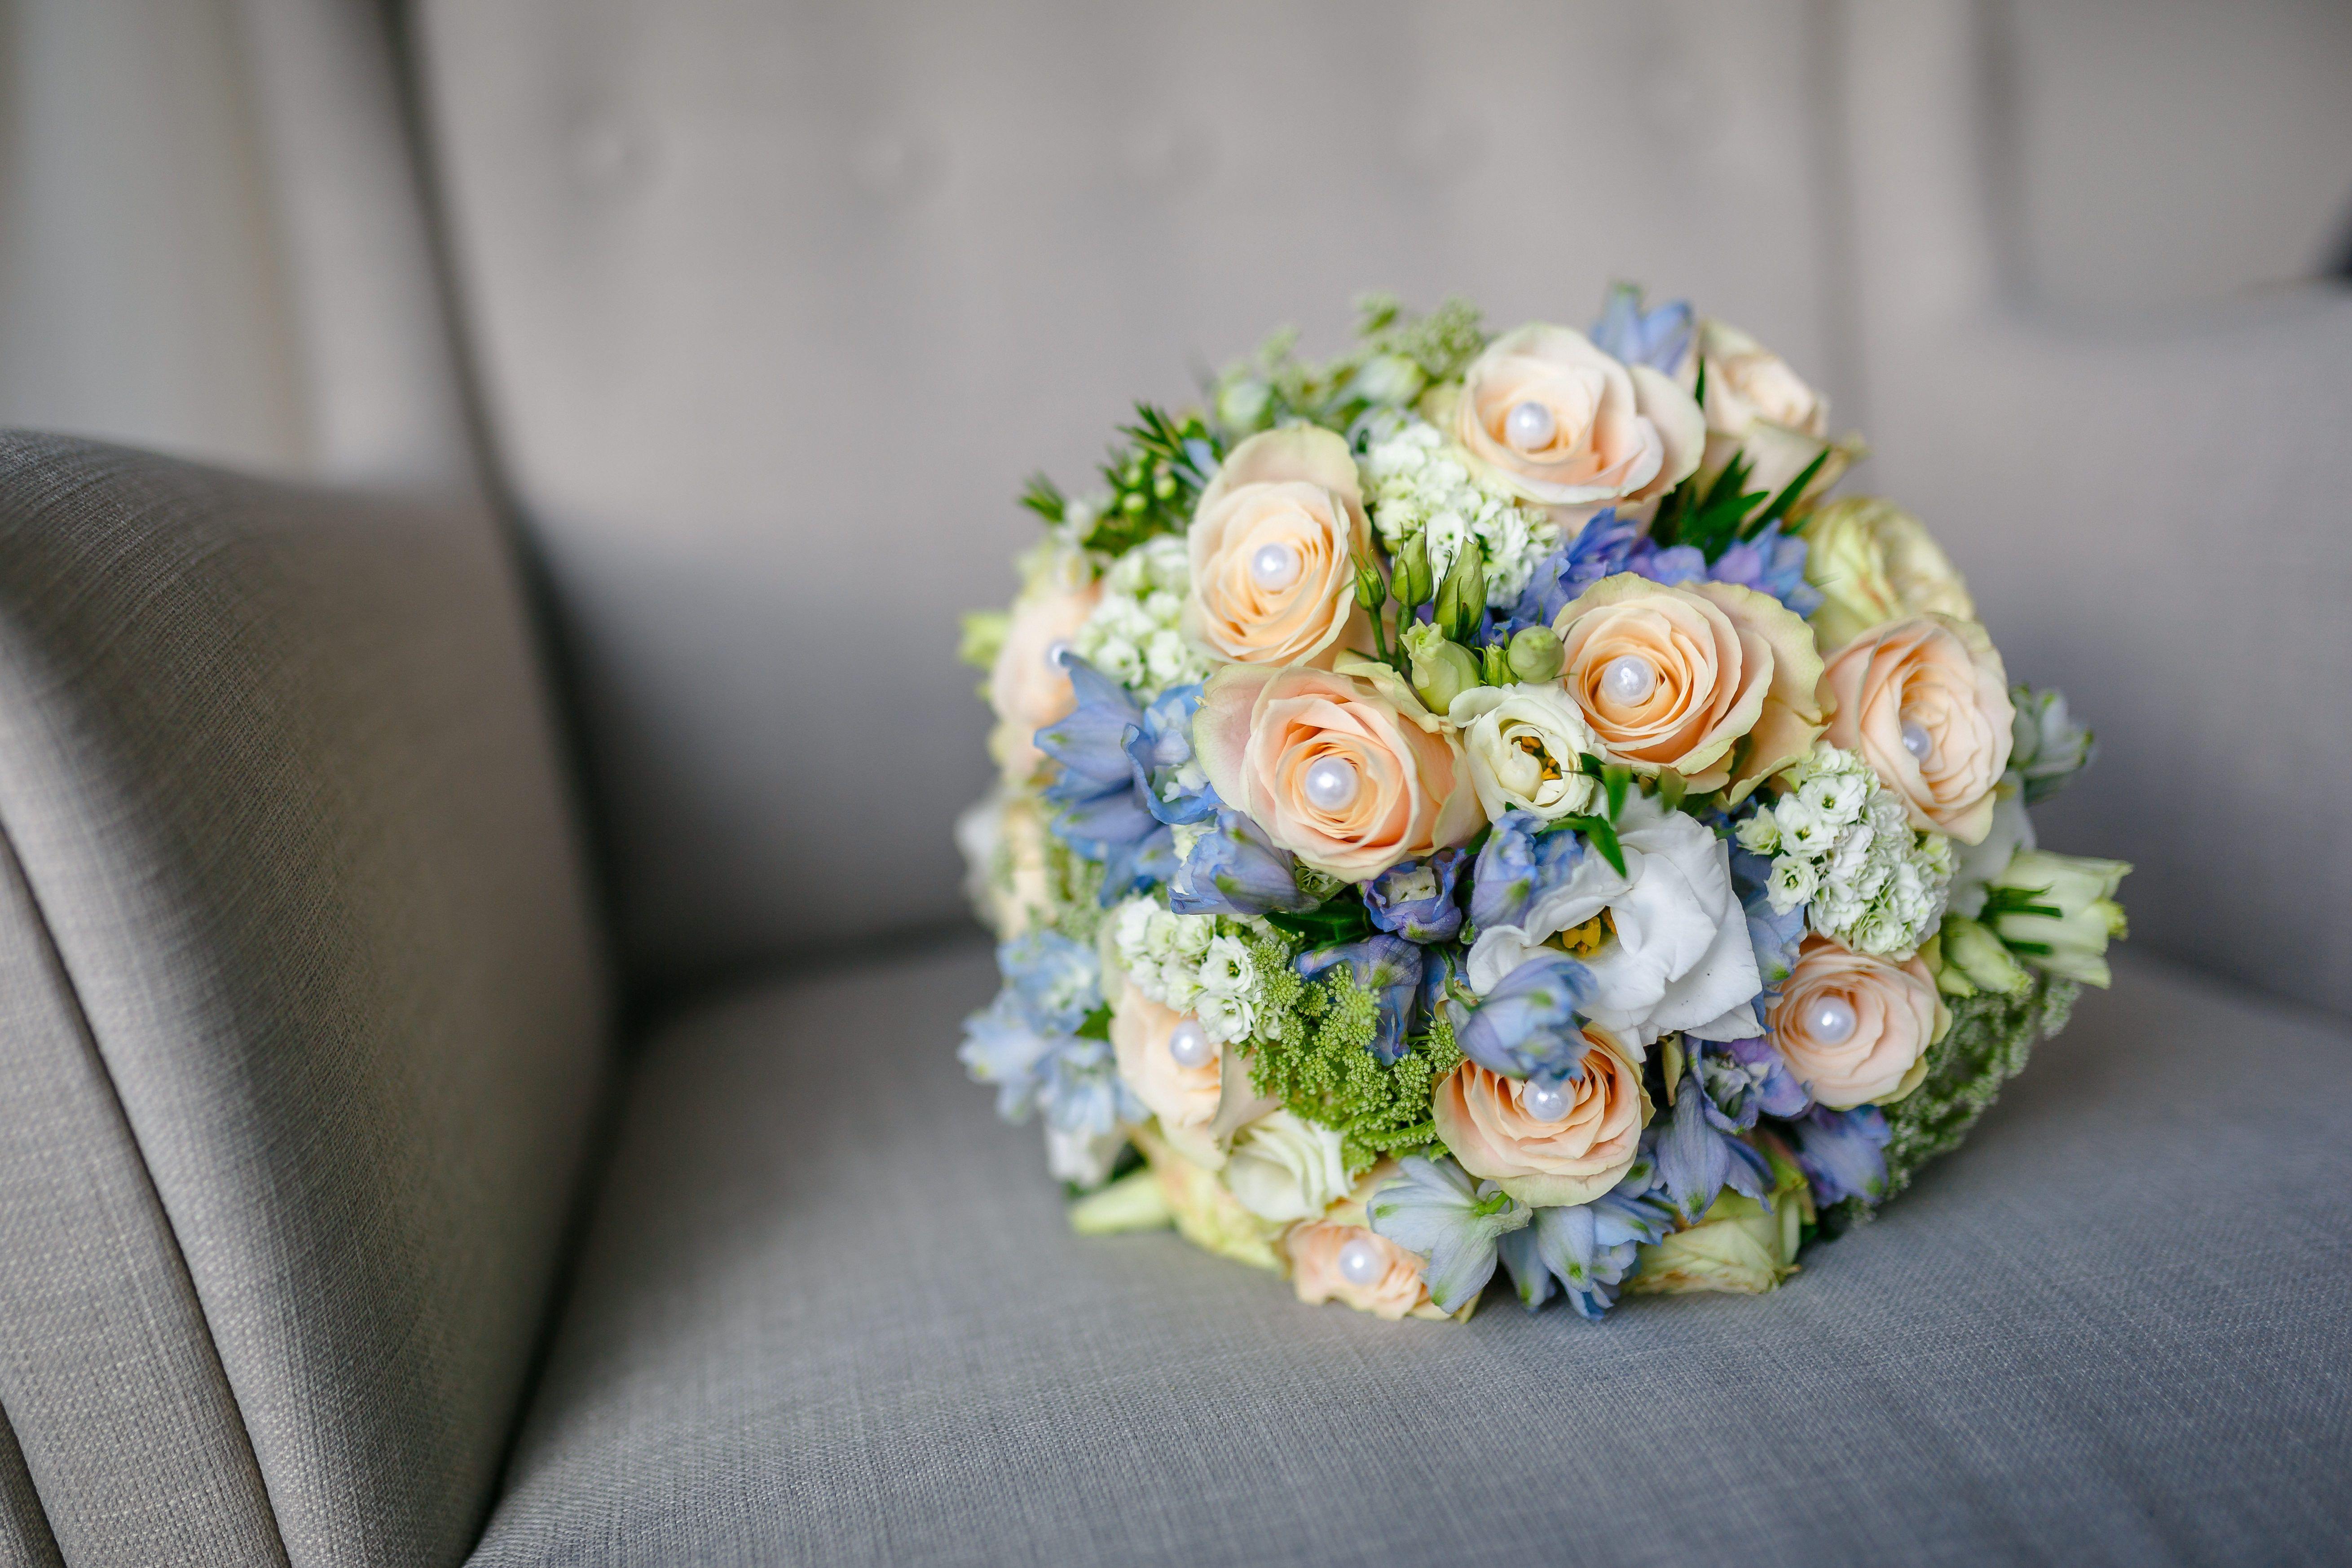 Bridal Bouque Blue Apricot Brautstrauss Apricot Blau Blumenstrauss Hochzeit Brautstrauss Braut Blumen